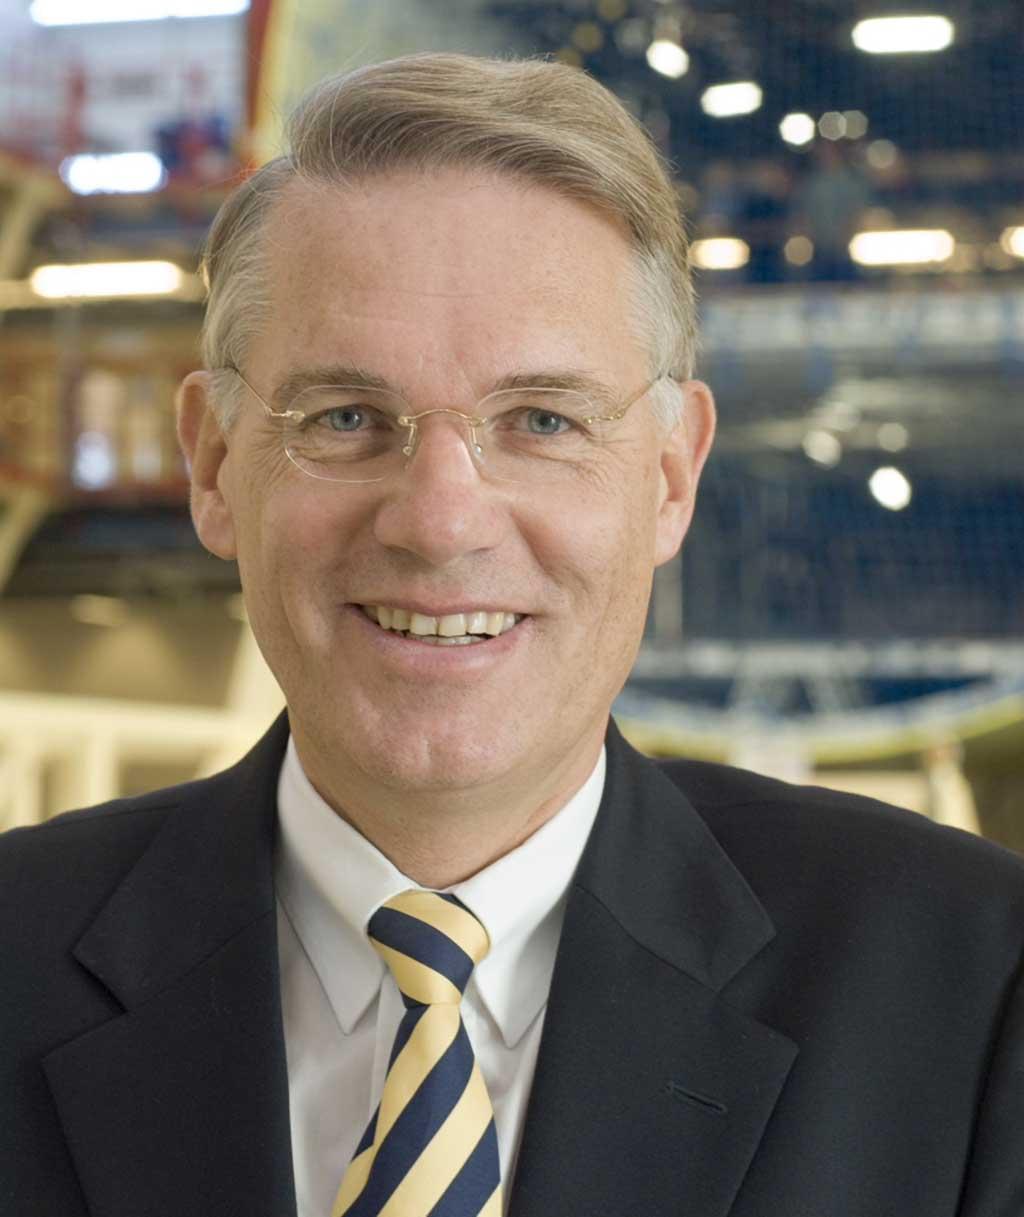 Dr. Georg Mecke